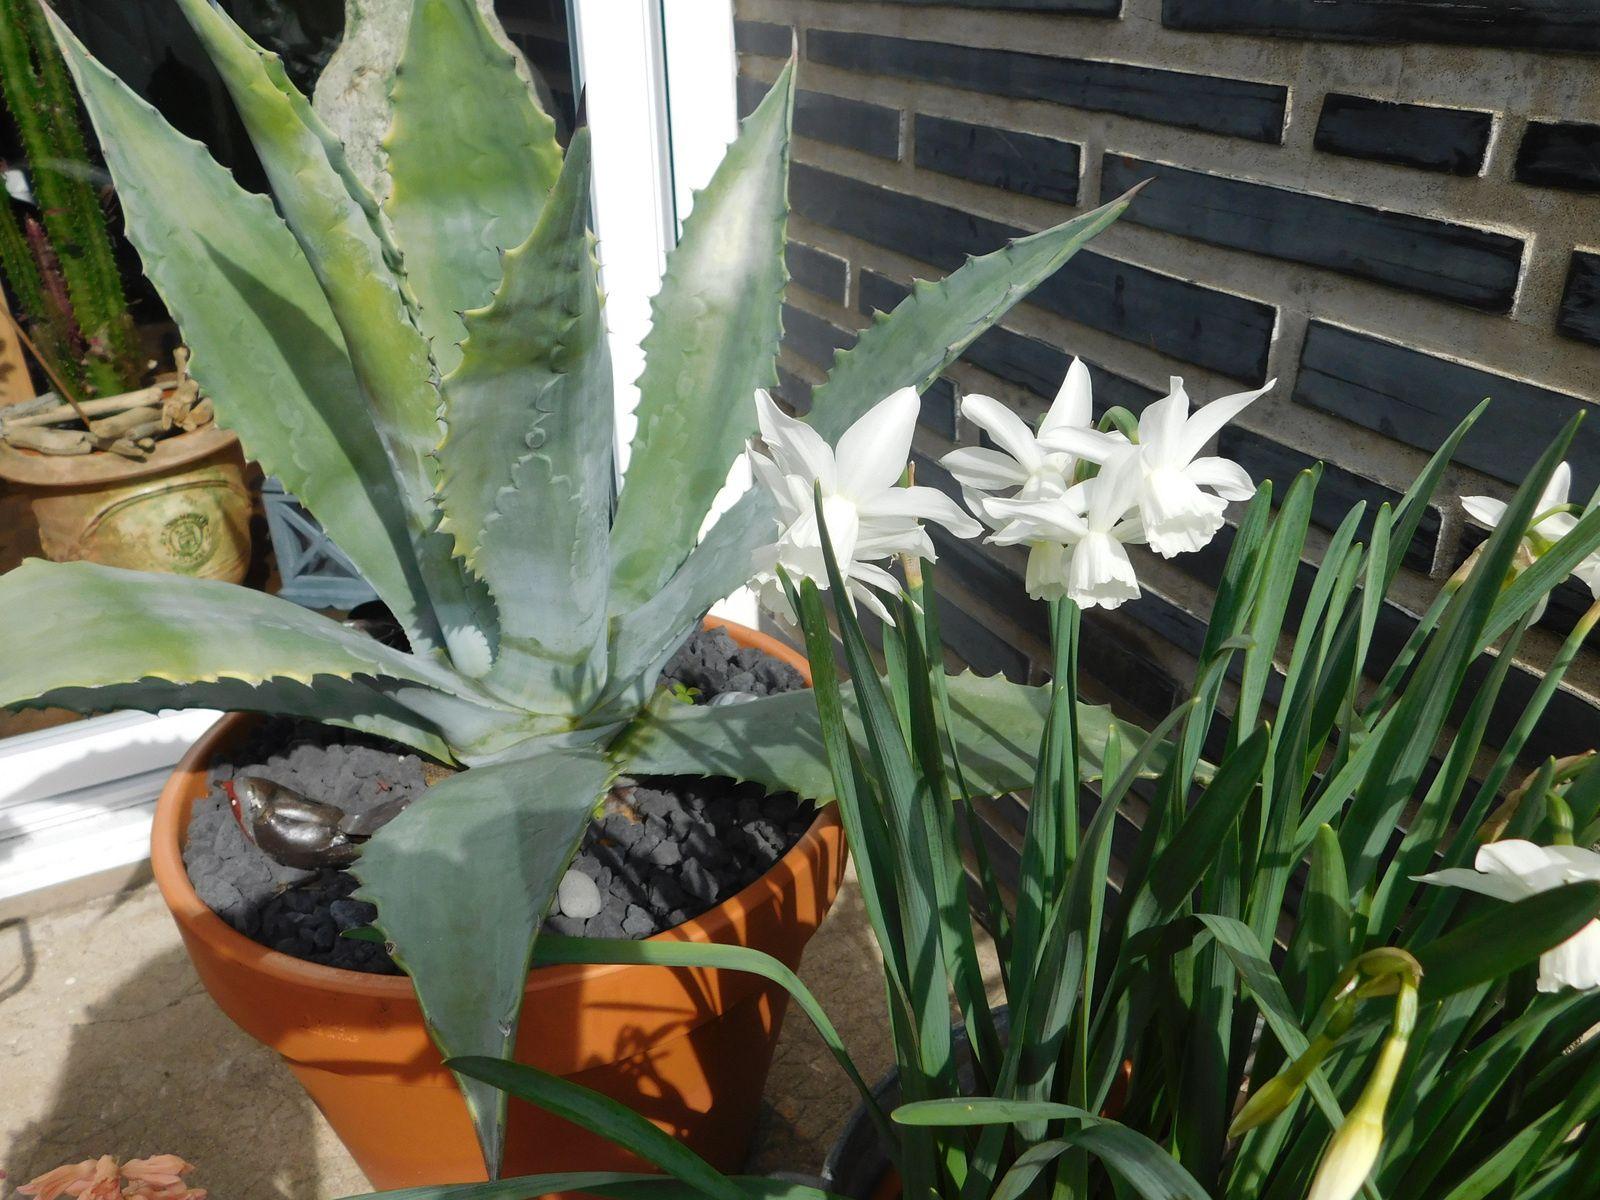 Narcisse 'Thalia' et Agave americana.